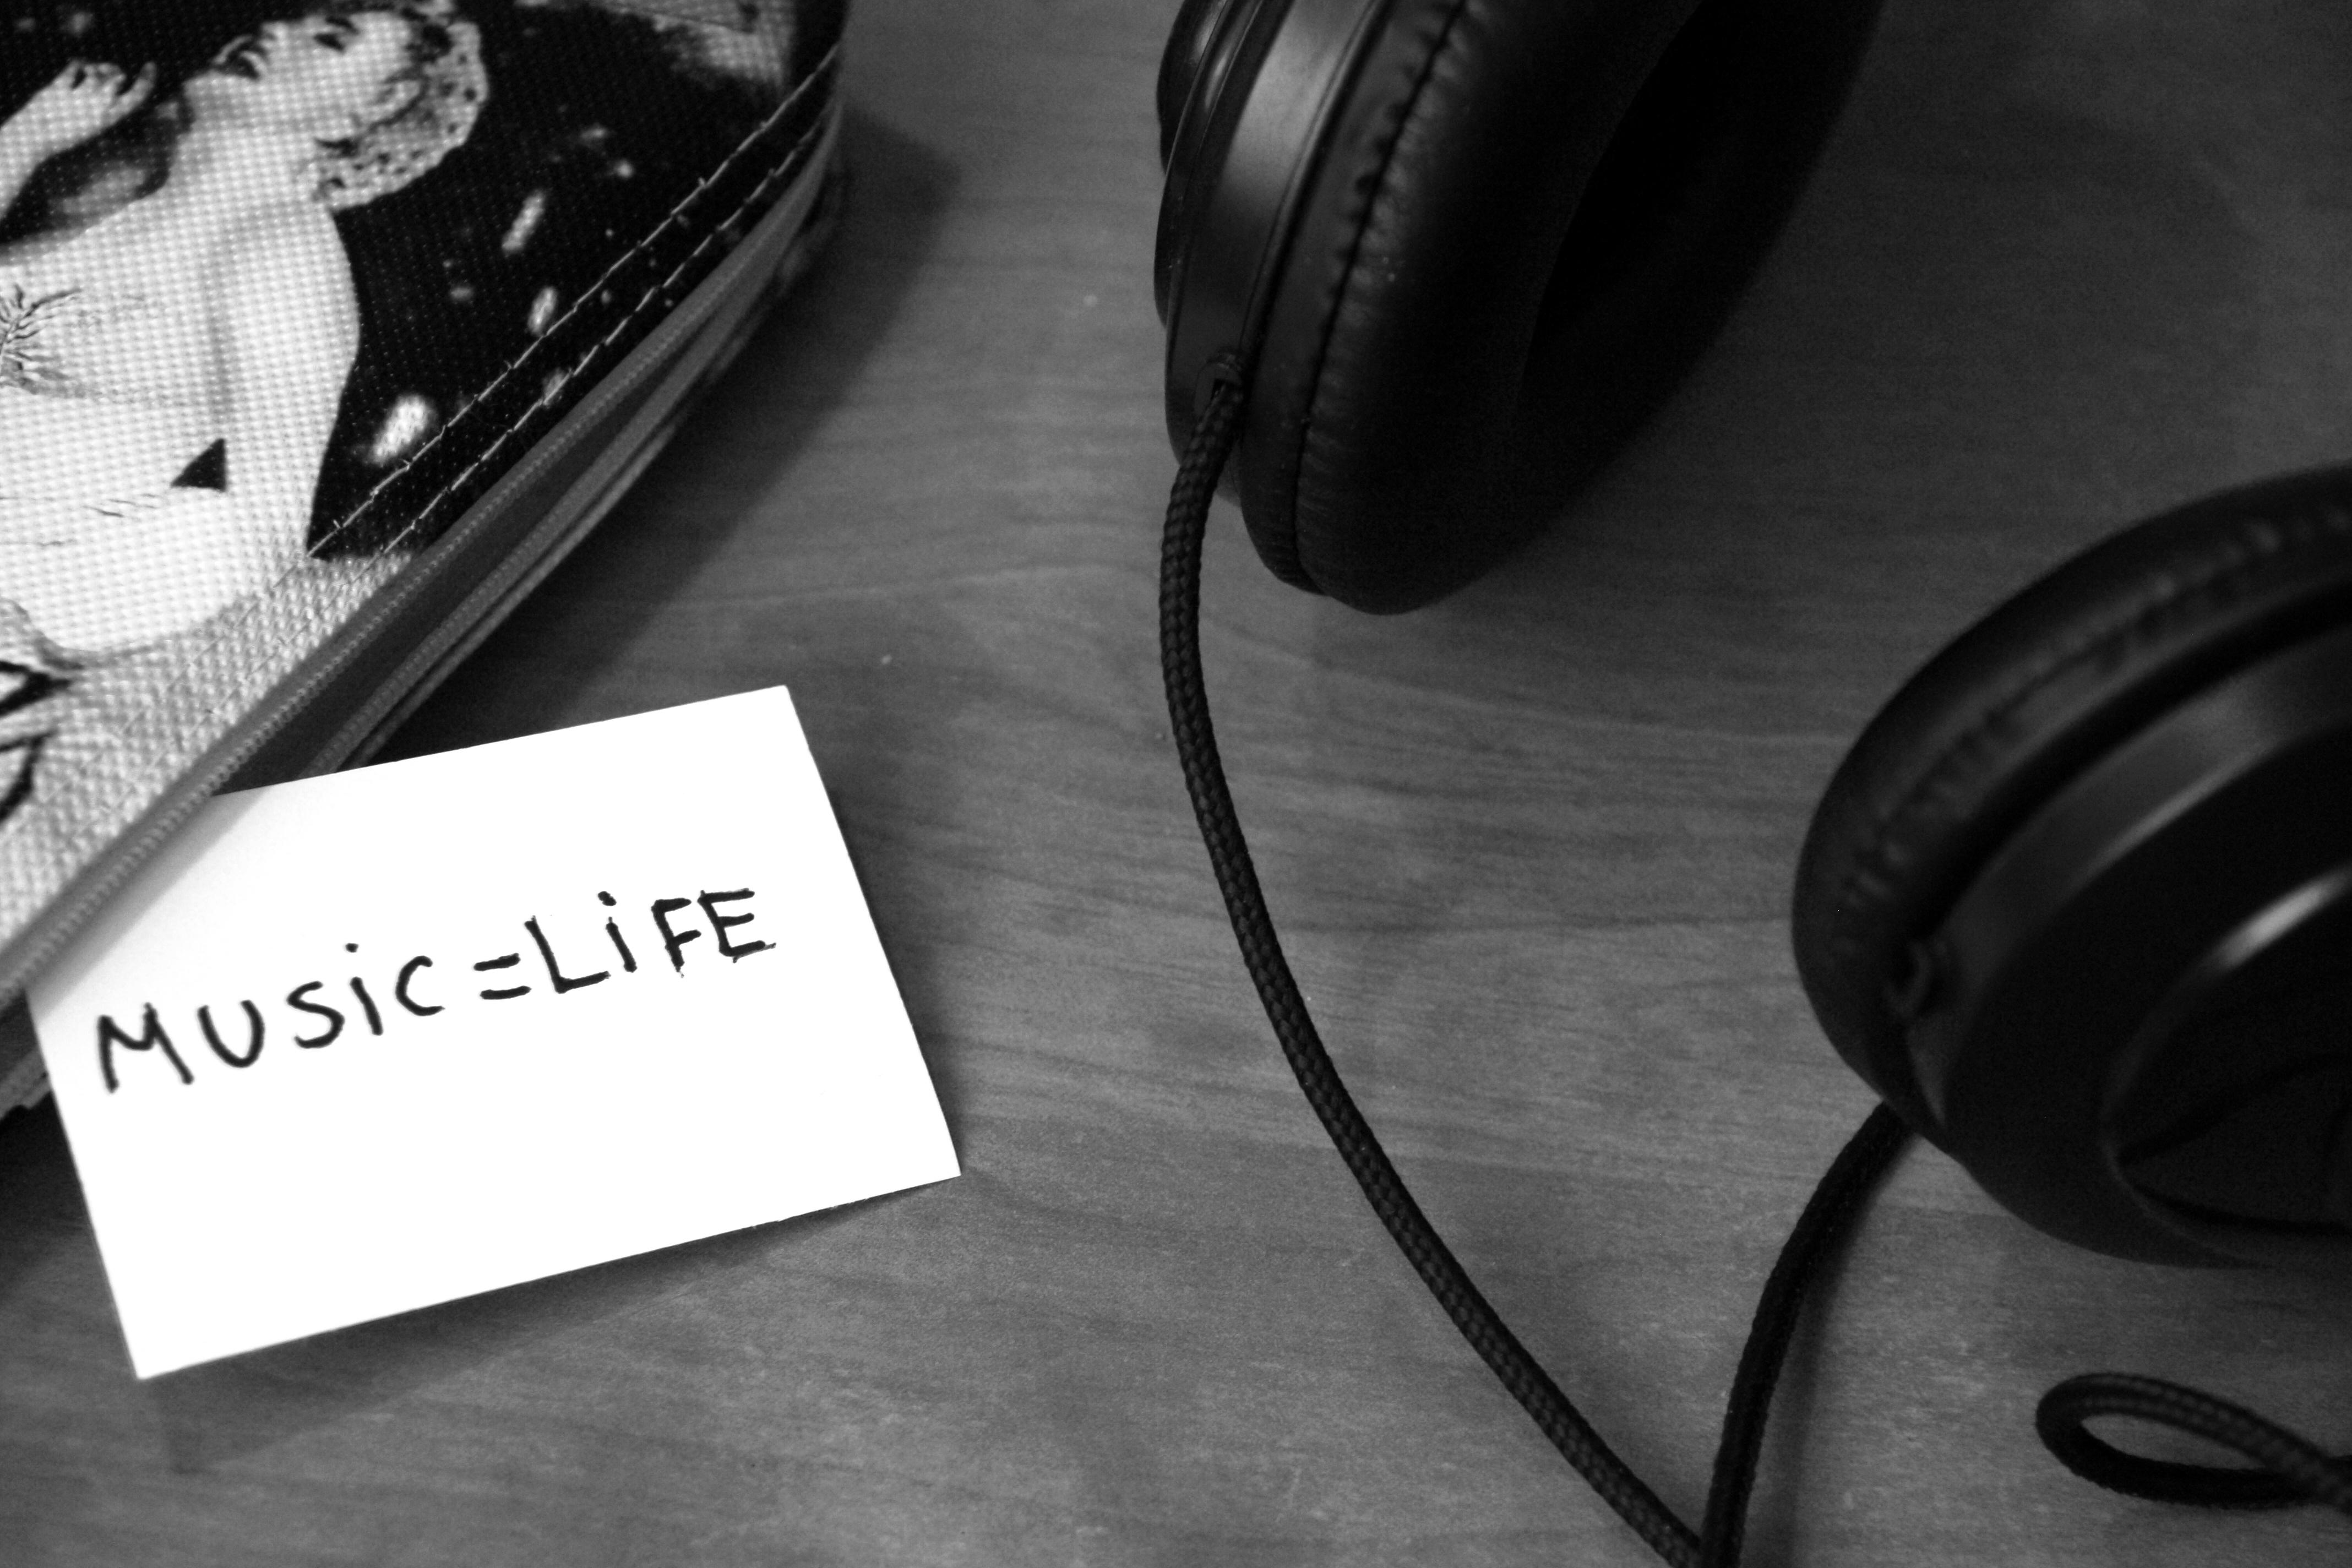 http://www.imoveilive.com/wp-content/uploads/2017/02/black-and-white-music-headphones-life.jpg